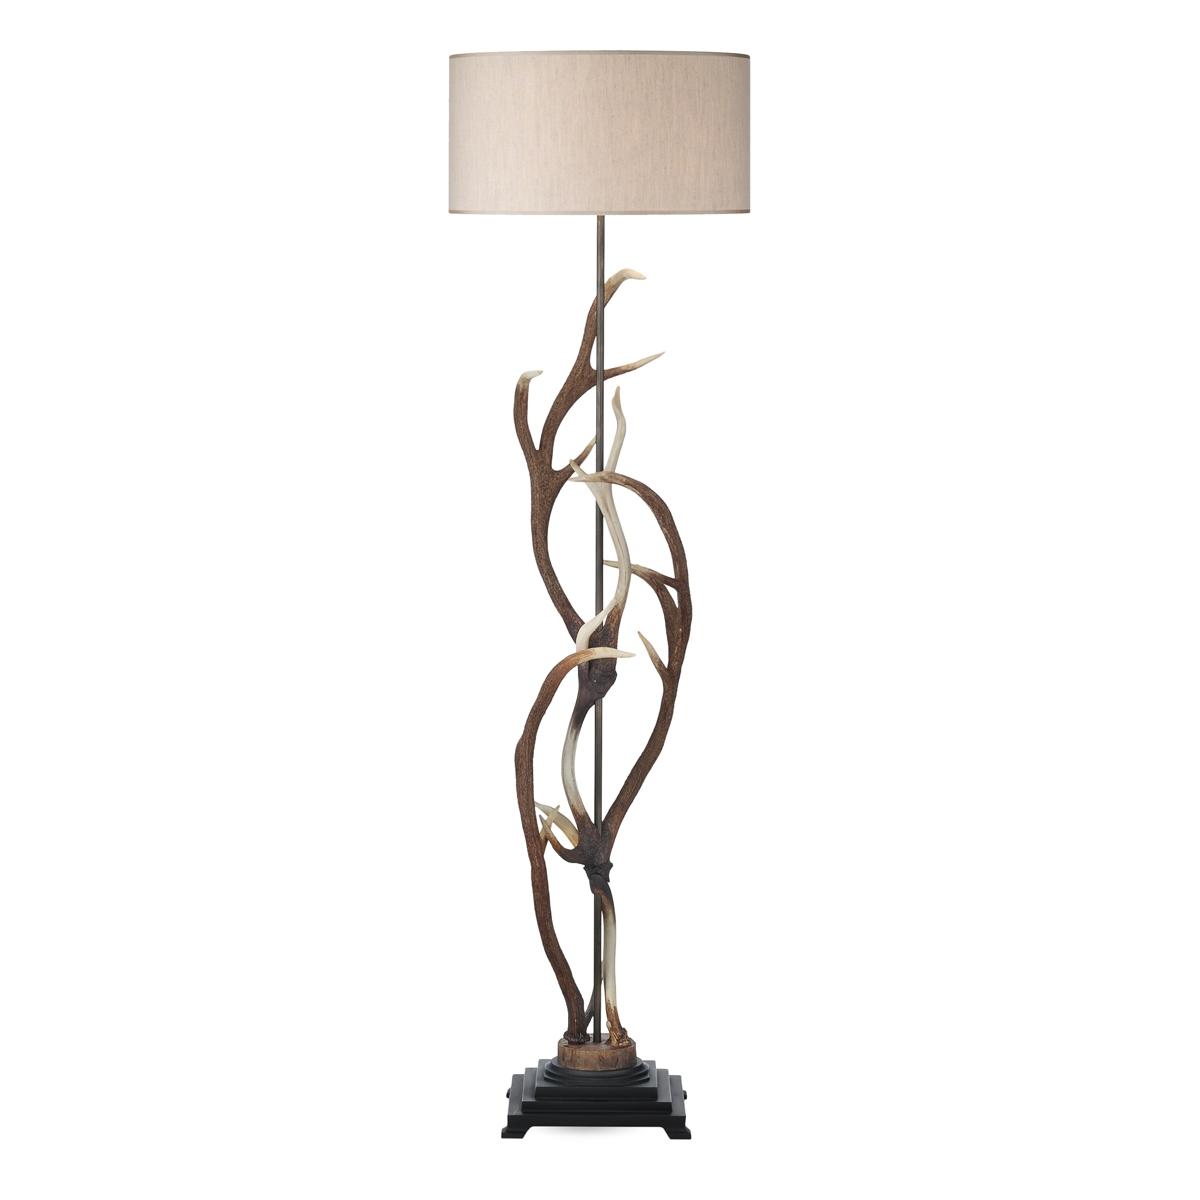 Antler Rustic Floor Lamp